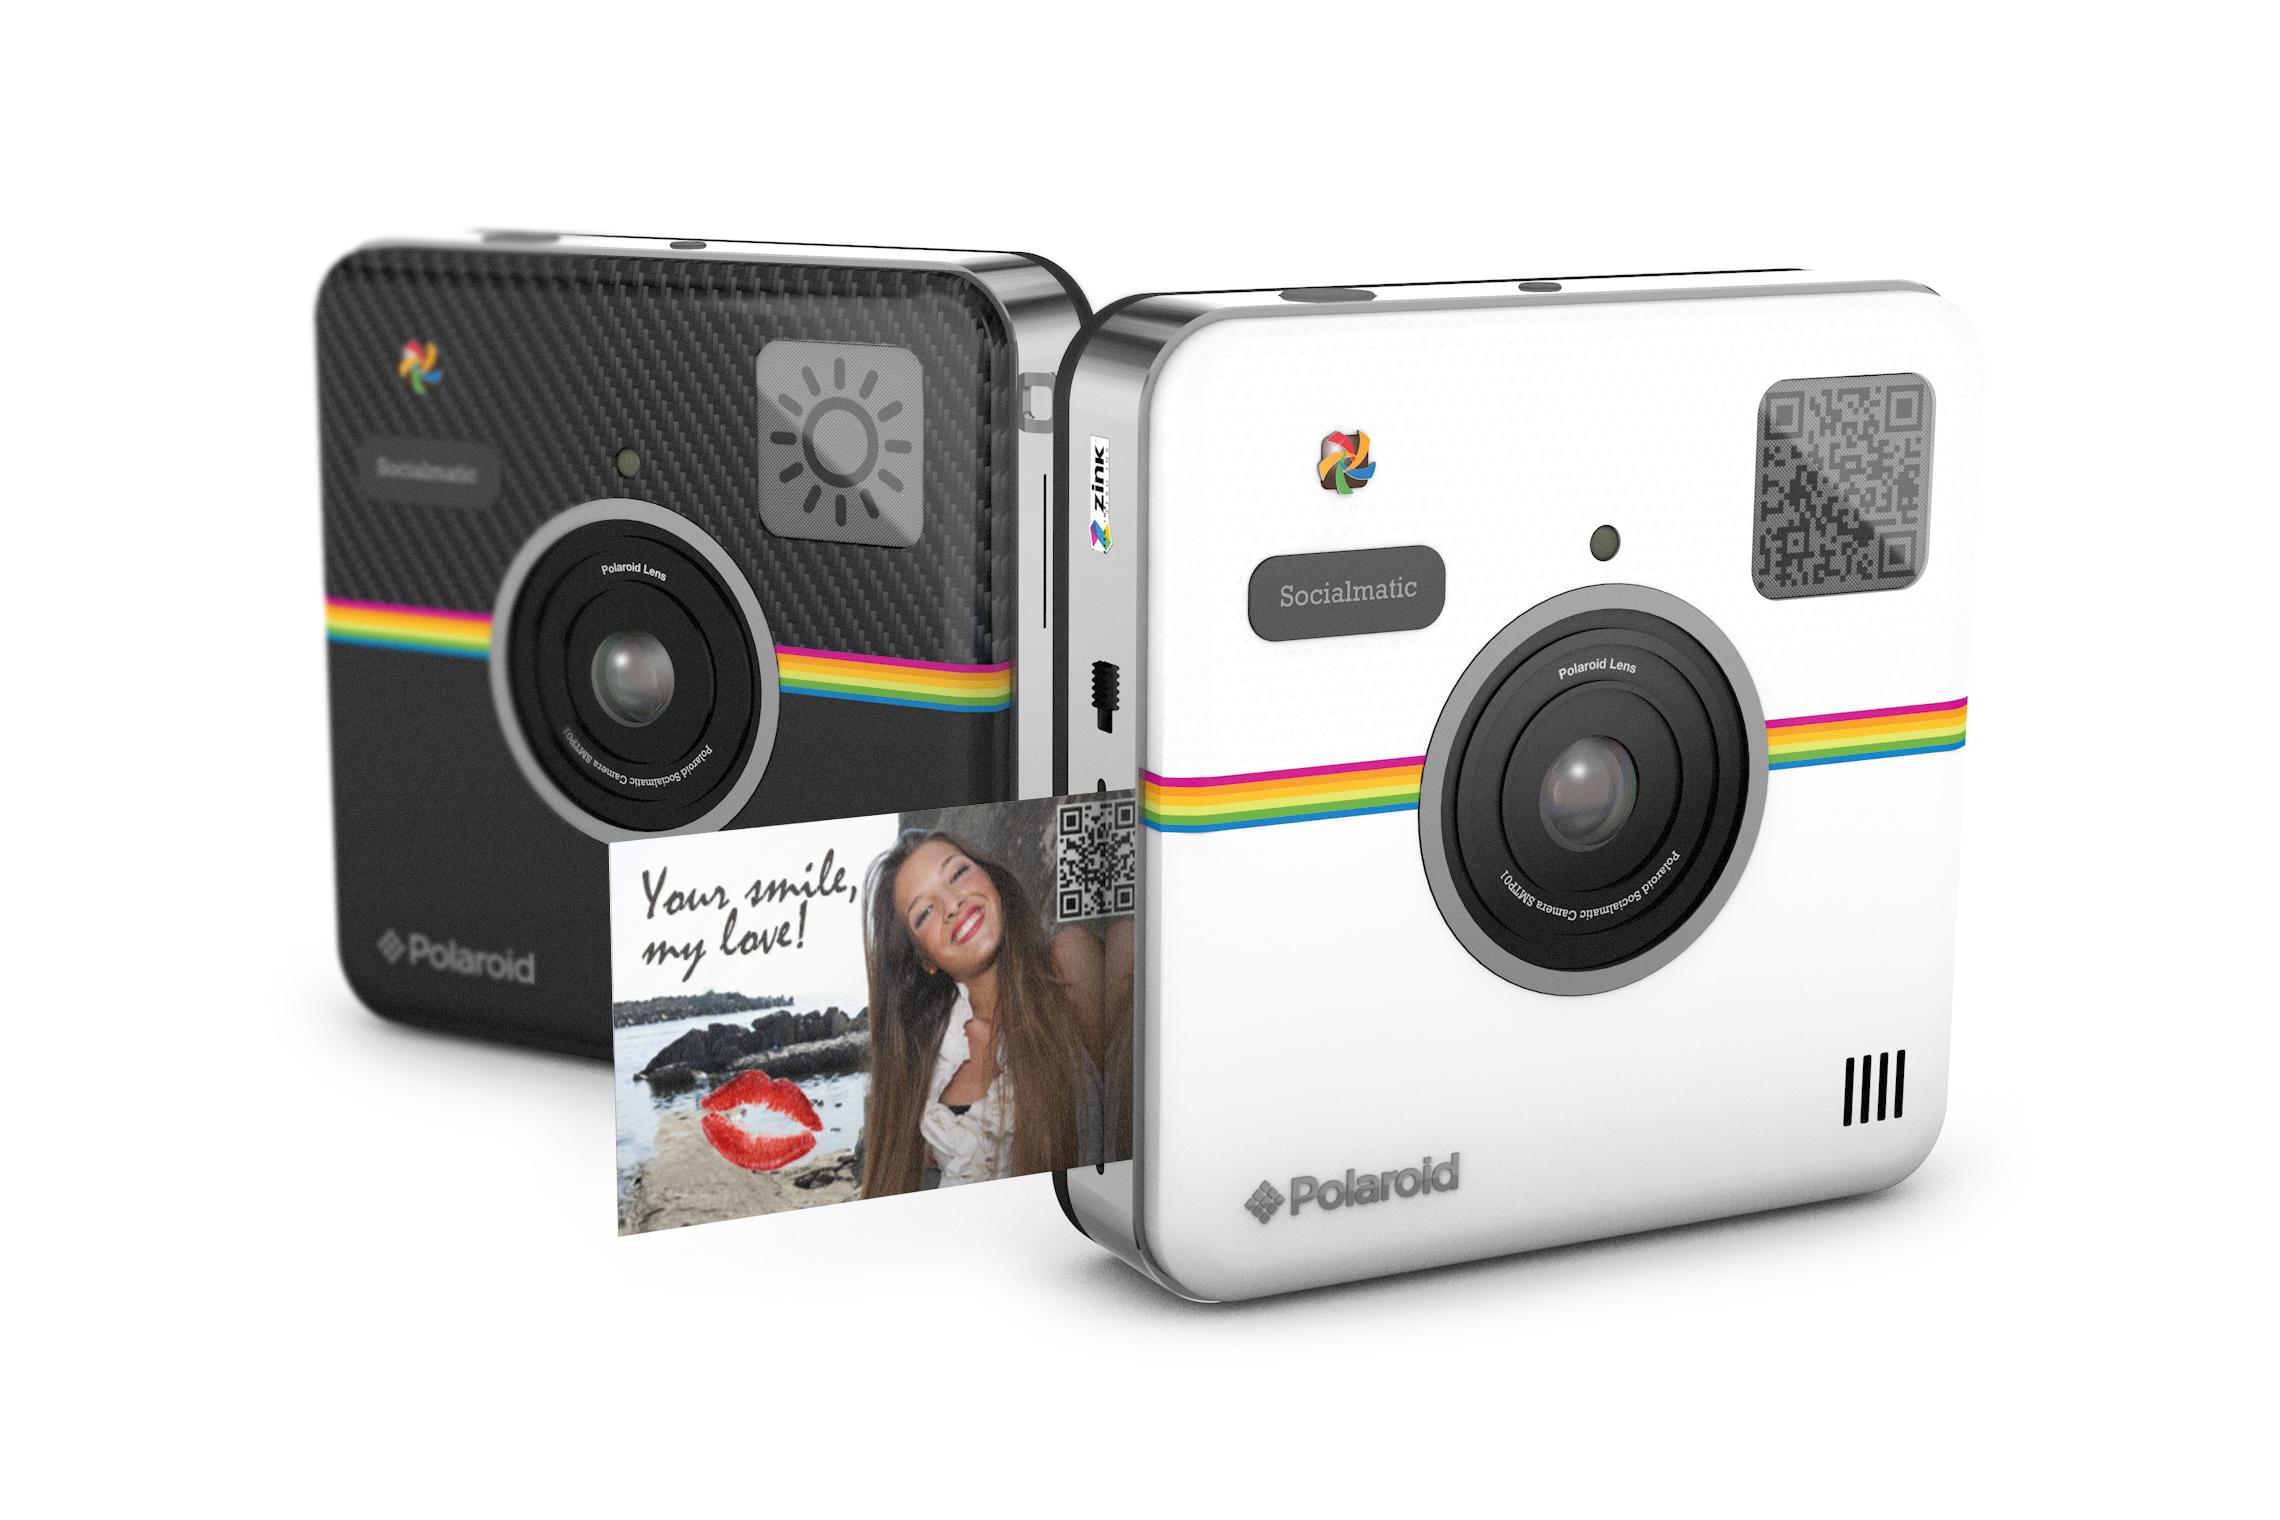 Polaroid Socialmatic Concept Camera to Become a Reality in 2014